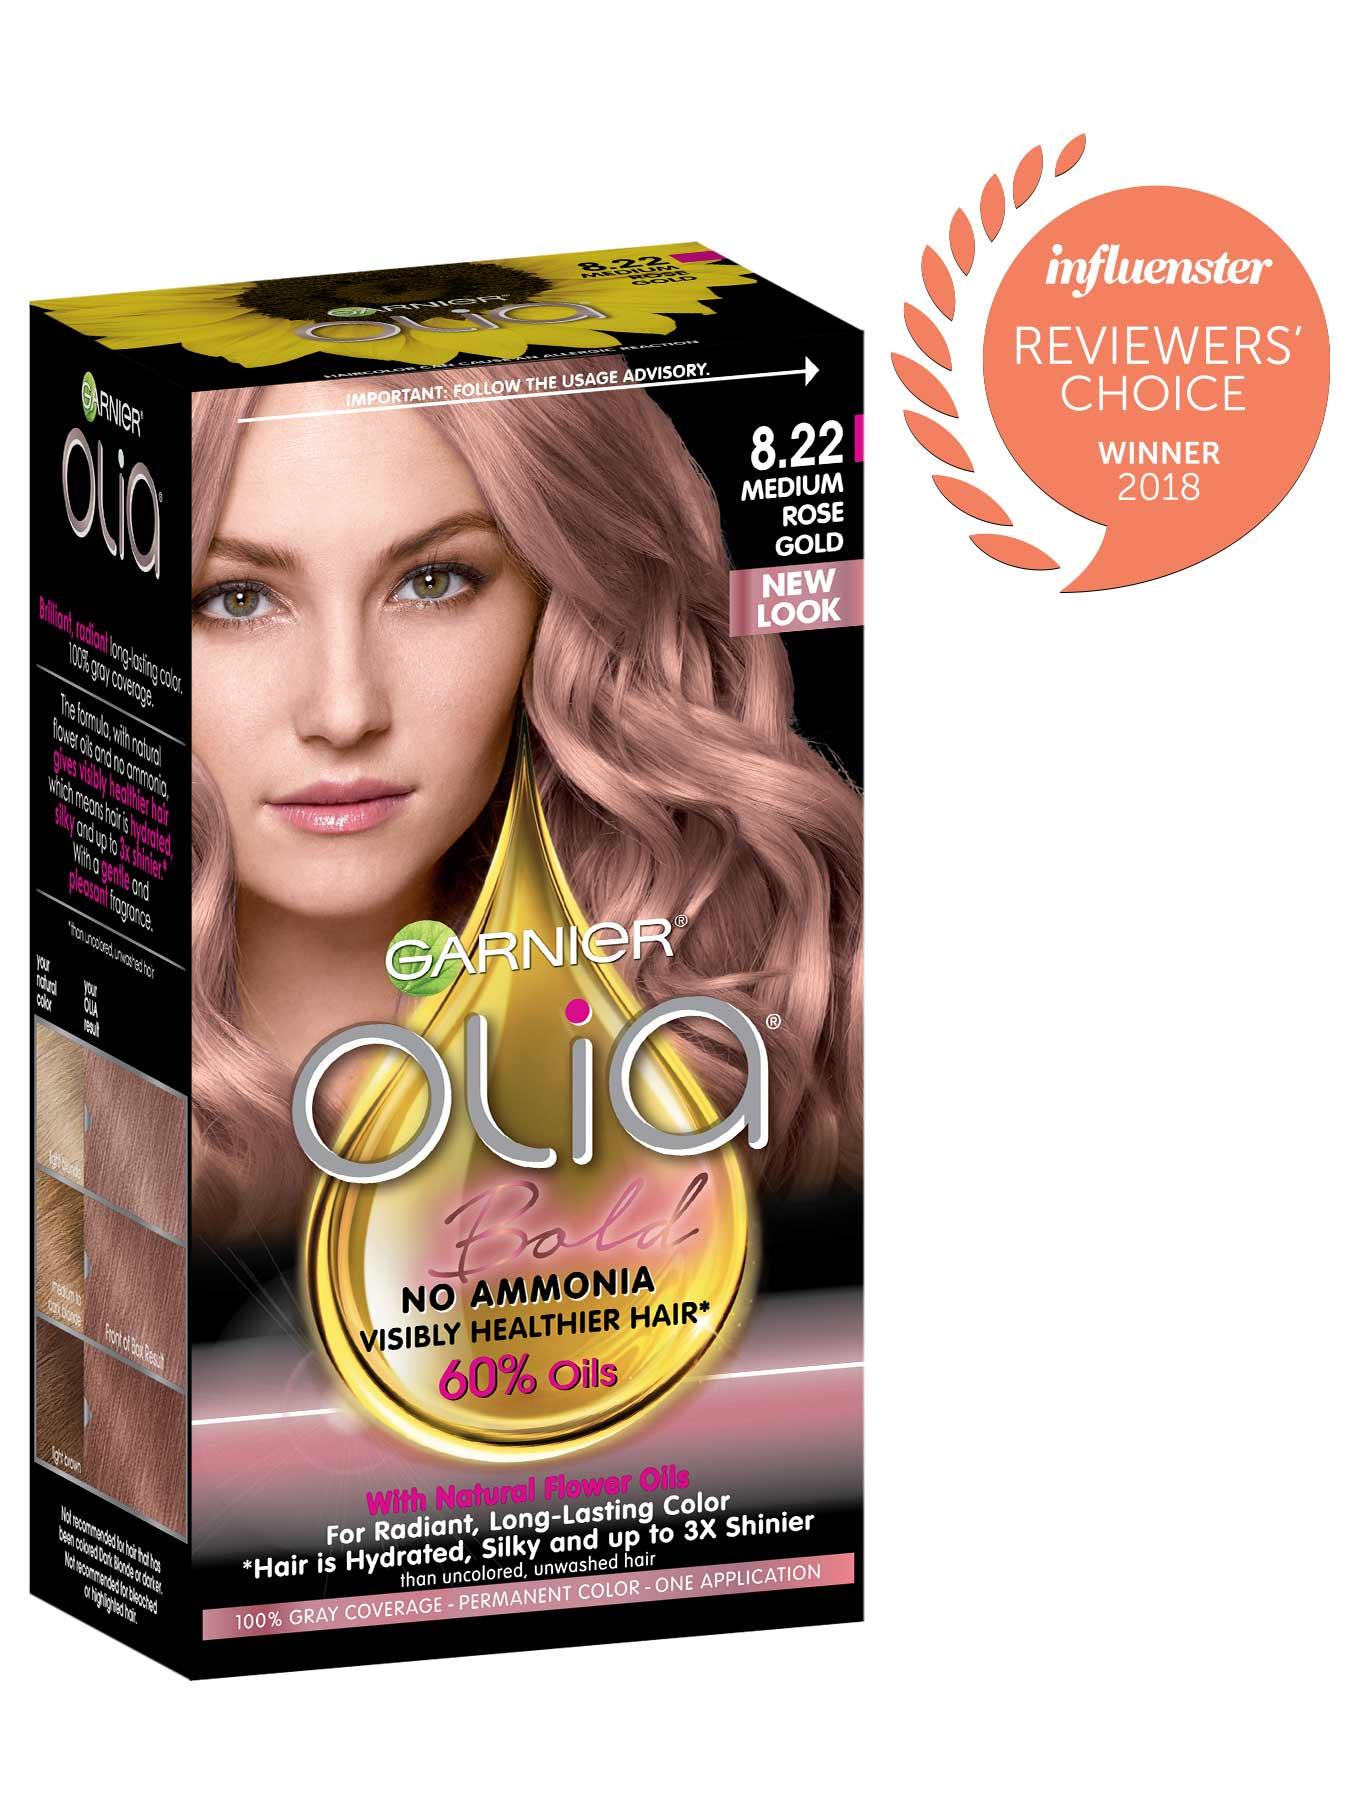 Olia Permanent Ammonia Free Hair Color Garnier Hair Color Rose Gold Gold Hair Colors Ammonia Free Hair Color